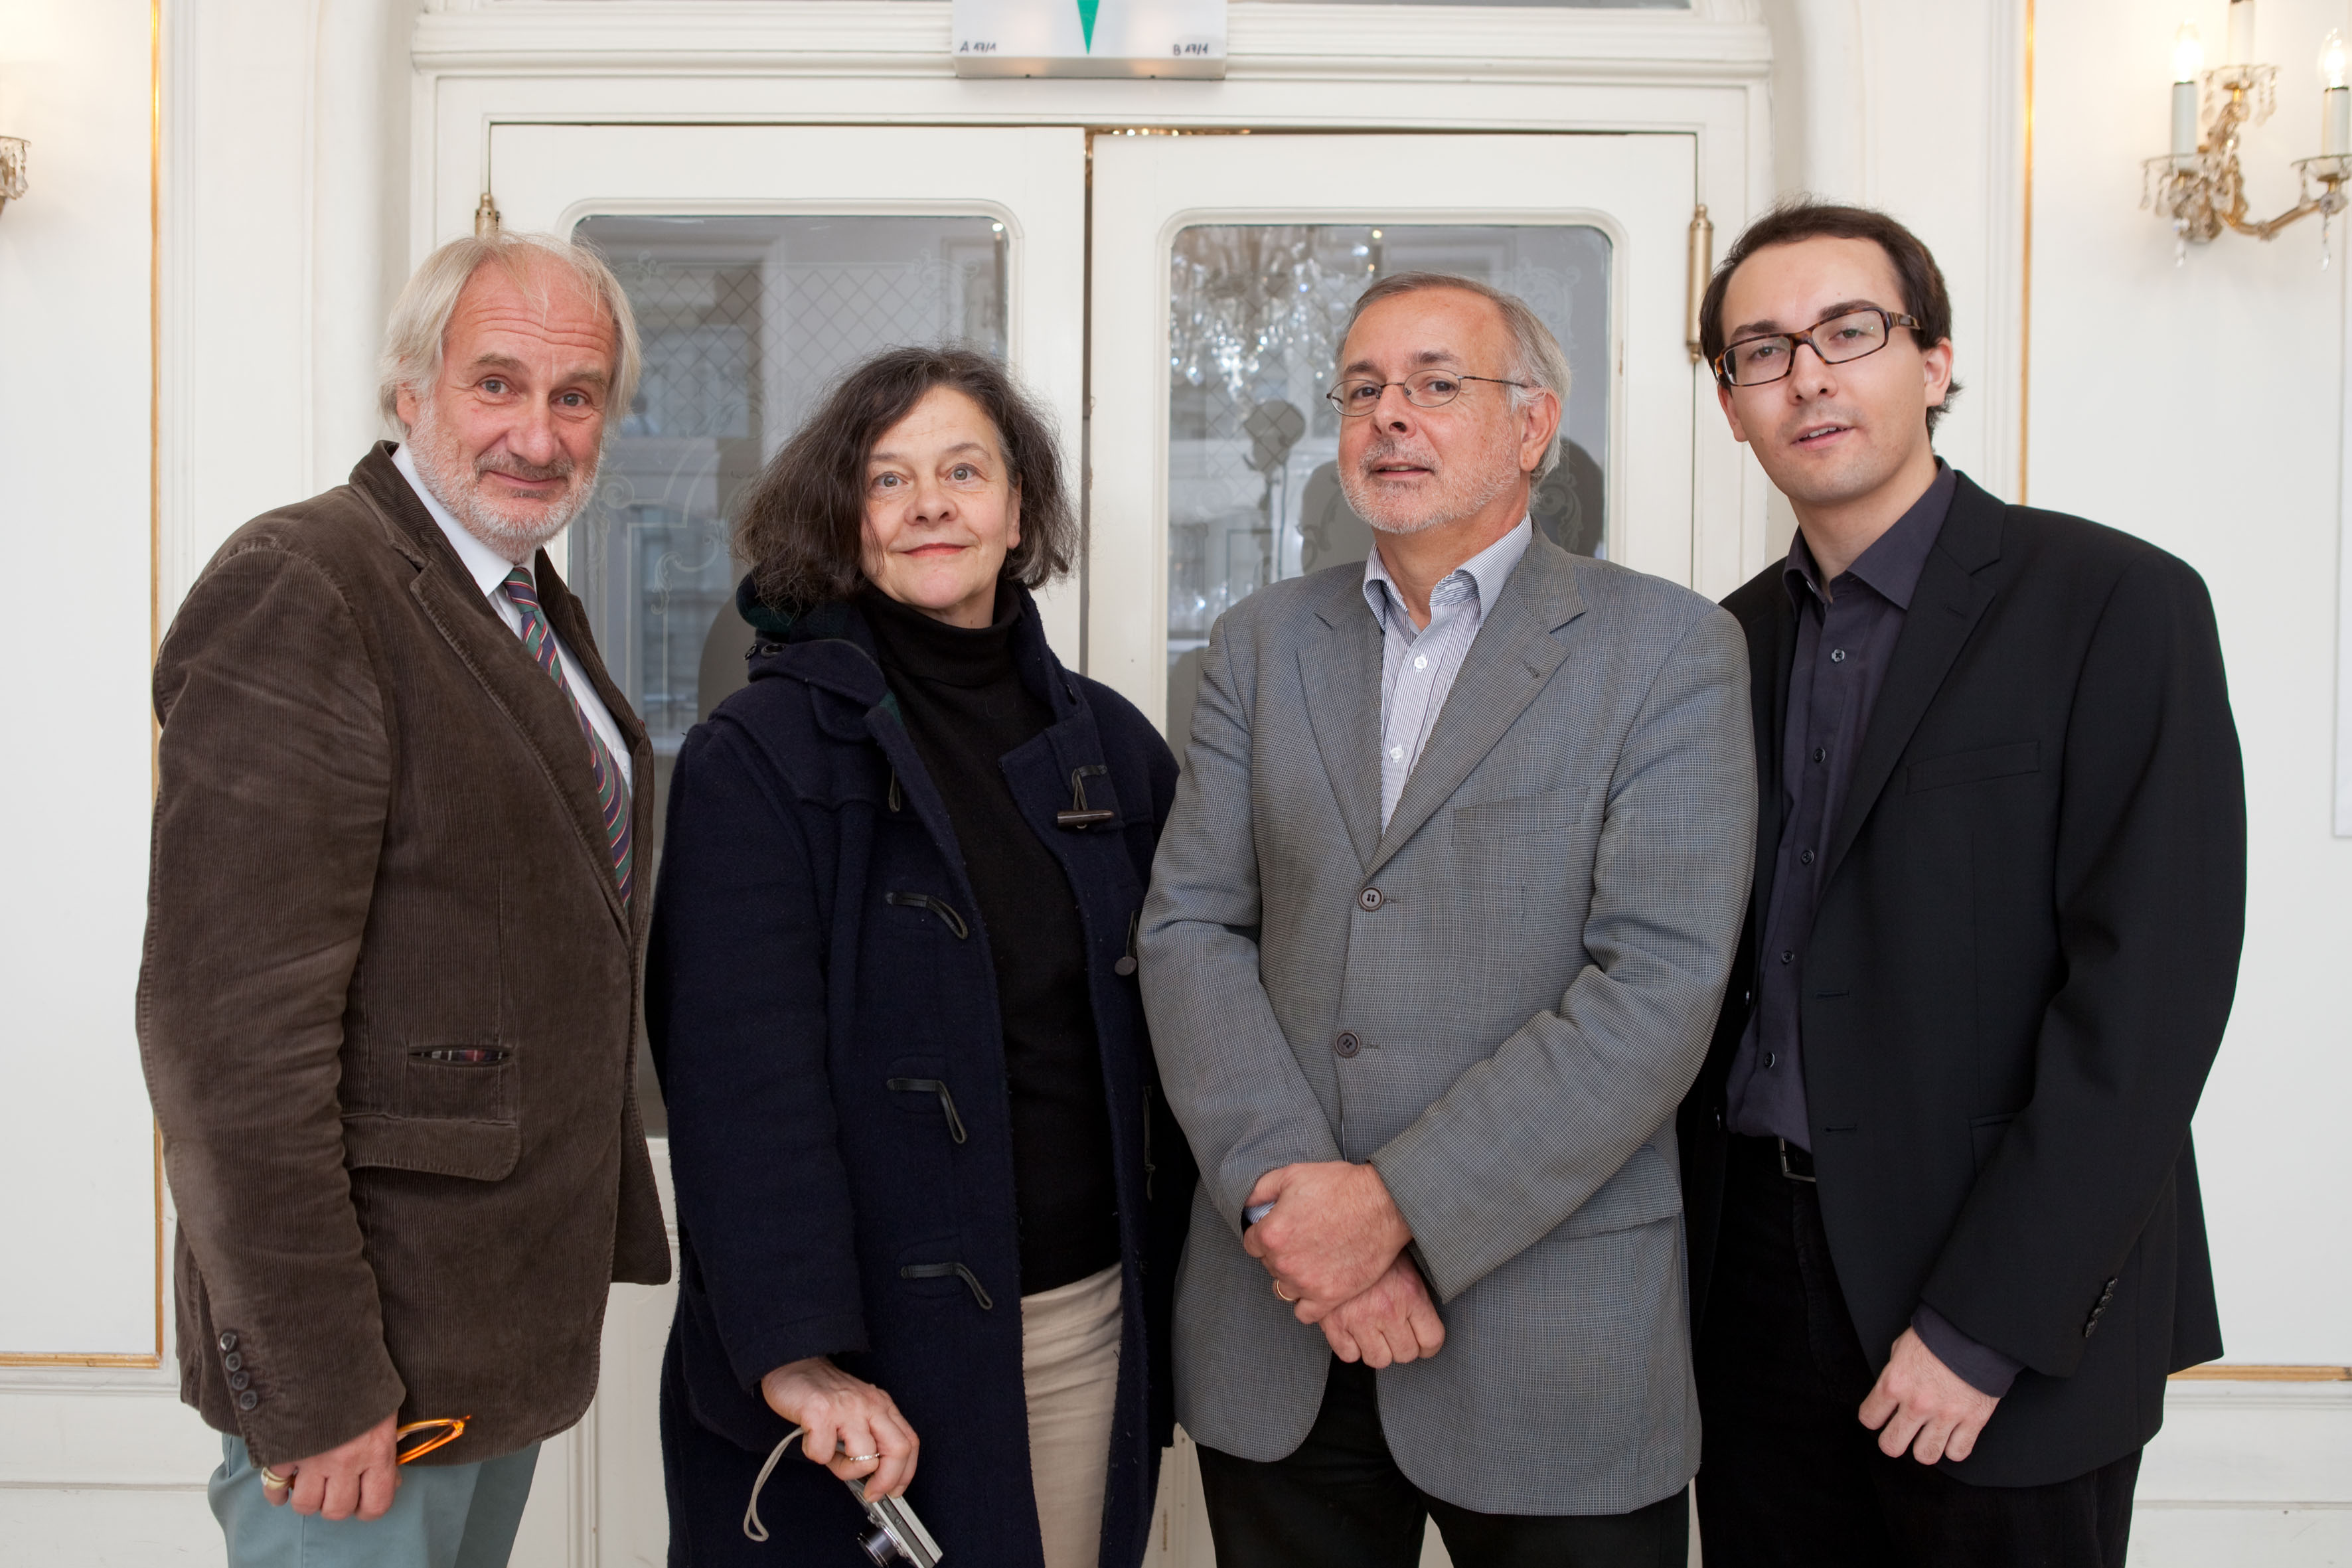 Michael Schottenberg / Heidi Baratta / Oliver Rathkolb / Reinhard Trinkler